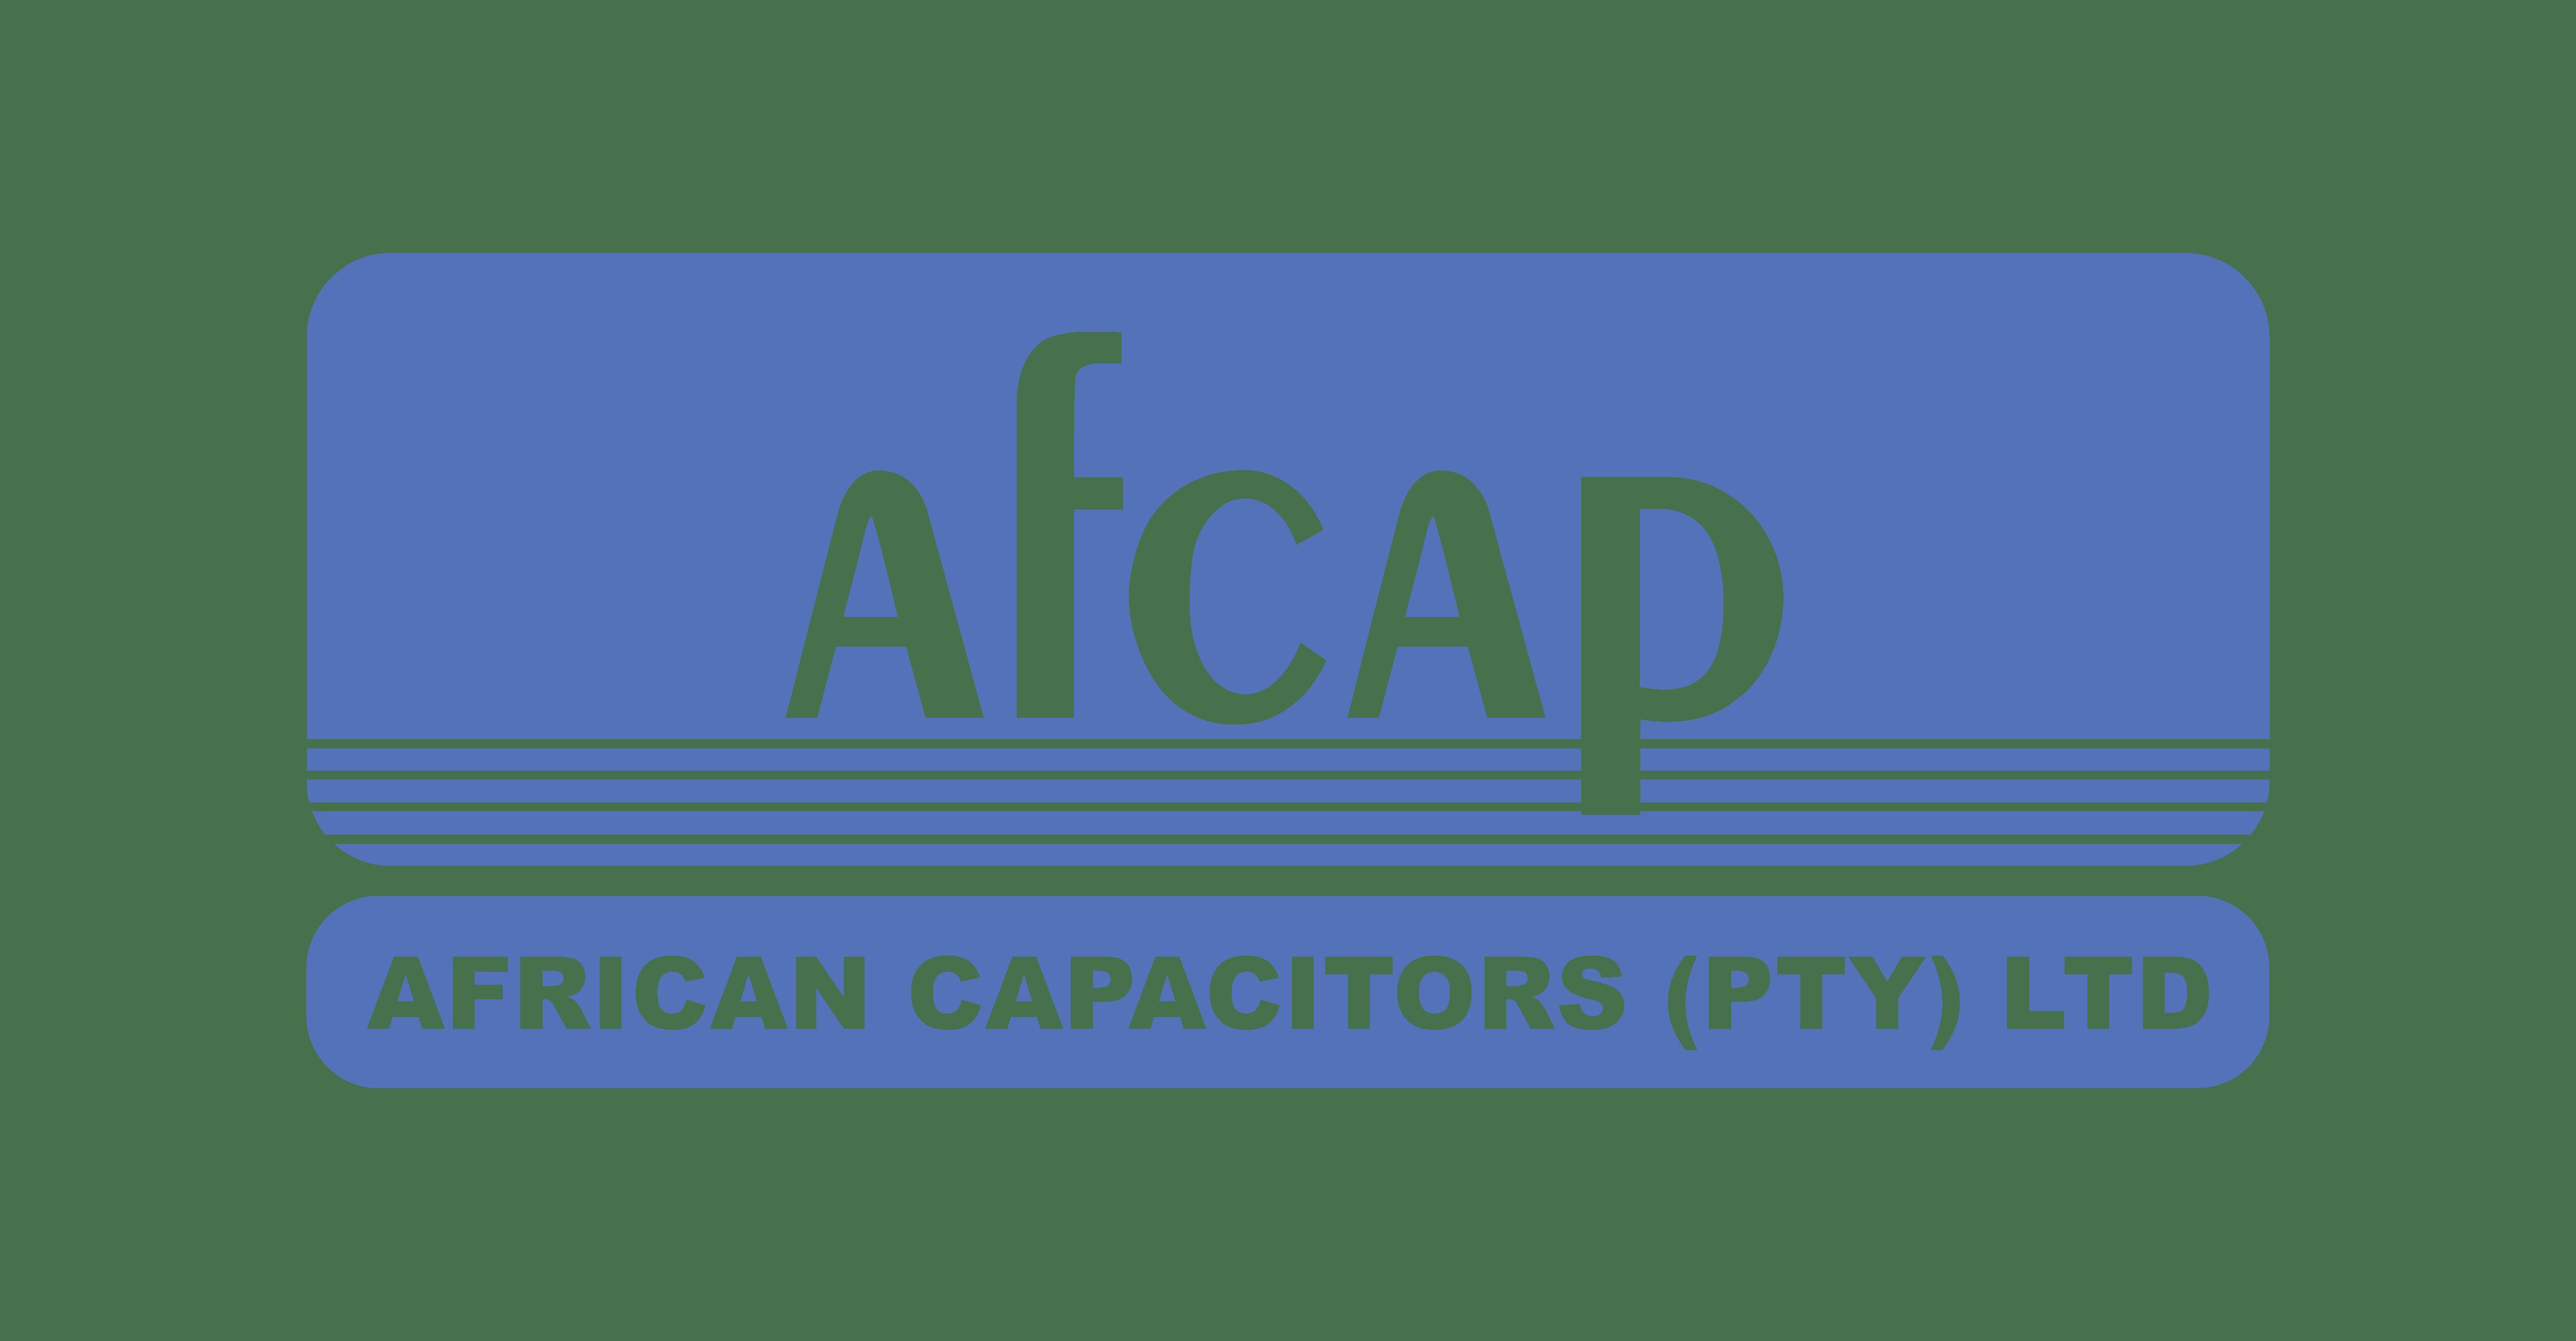 www.afcap.co.za